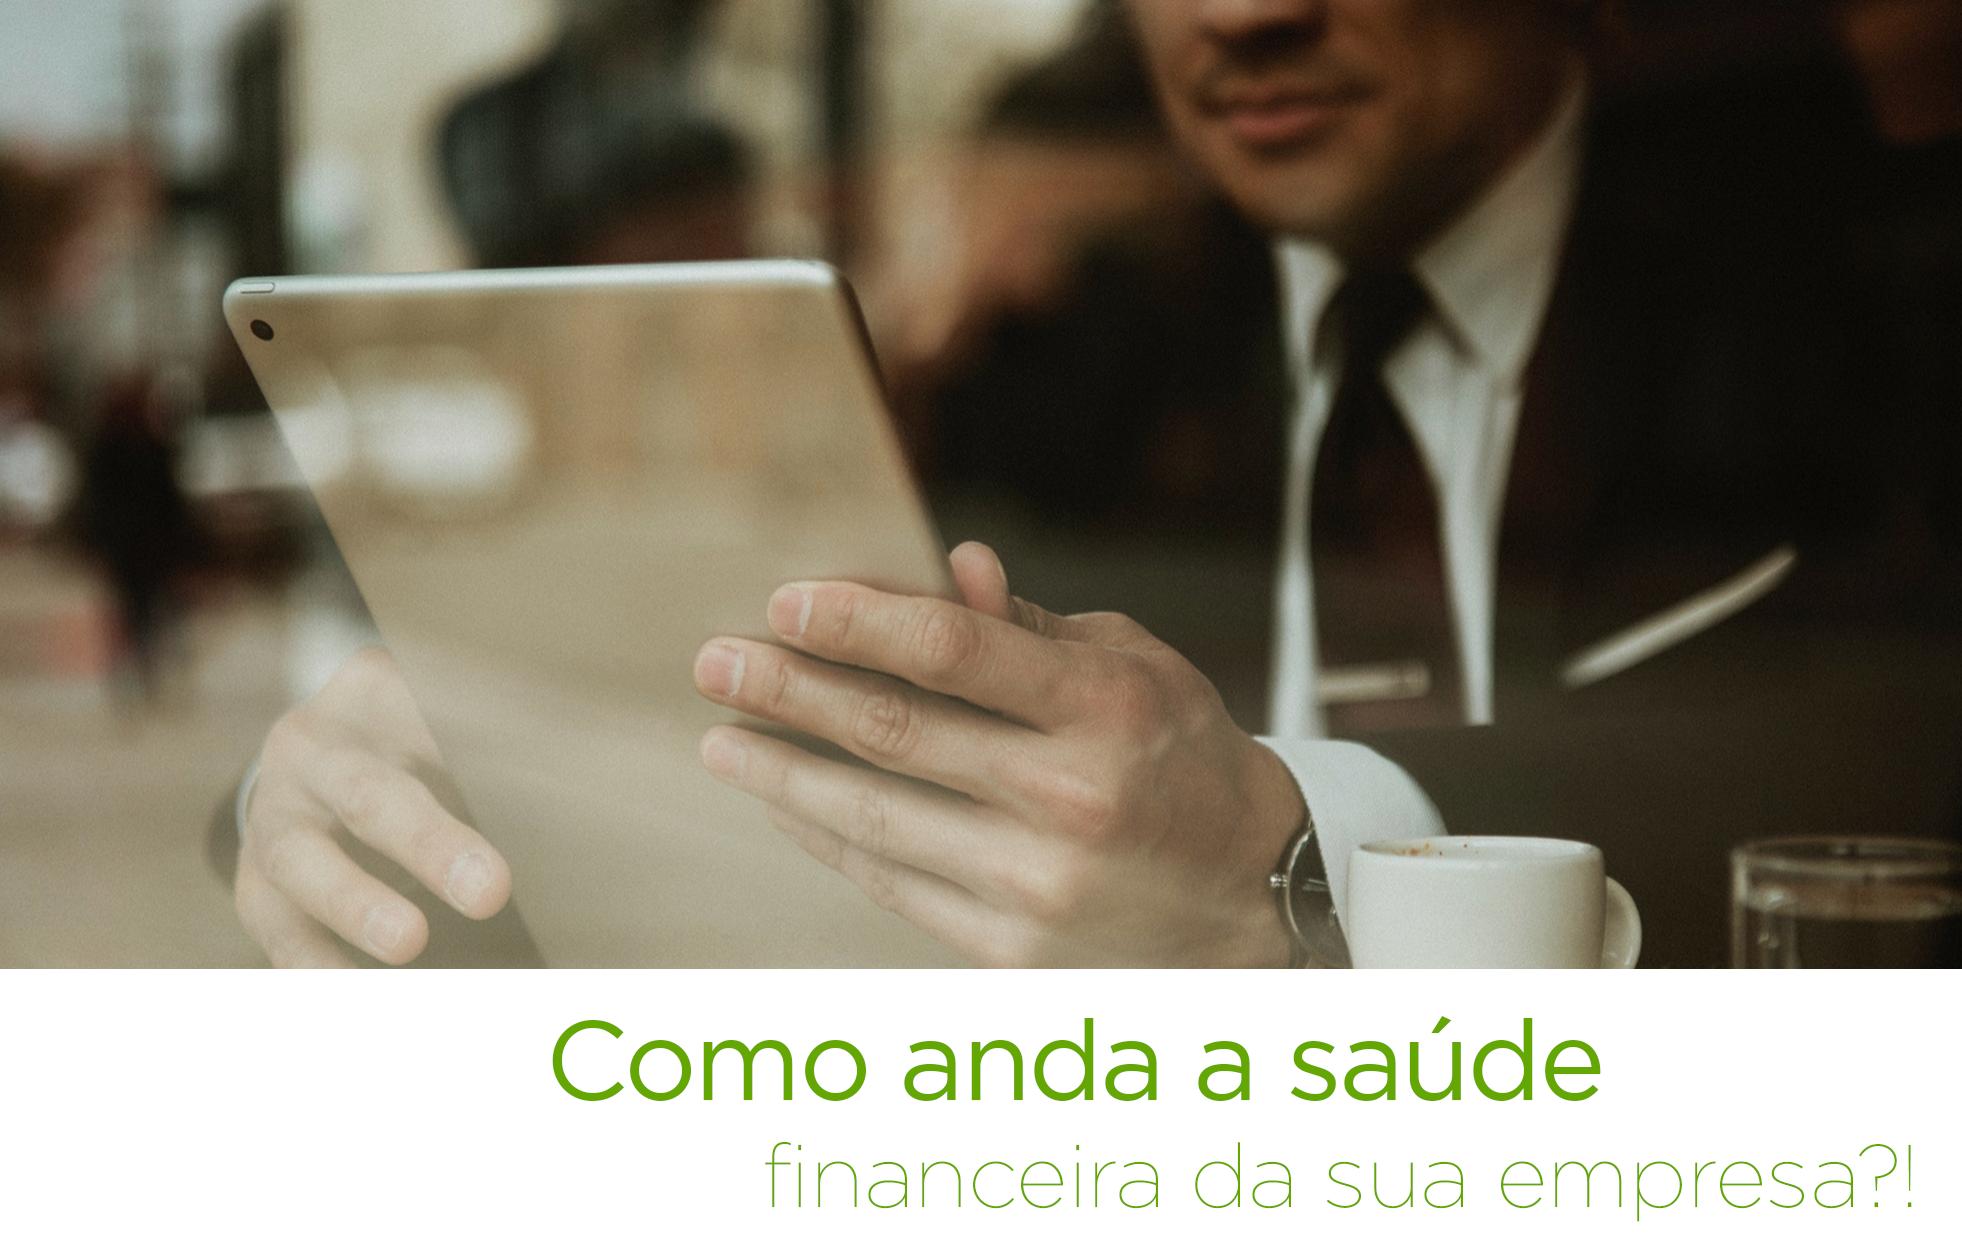 Saudefinanceira